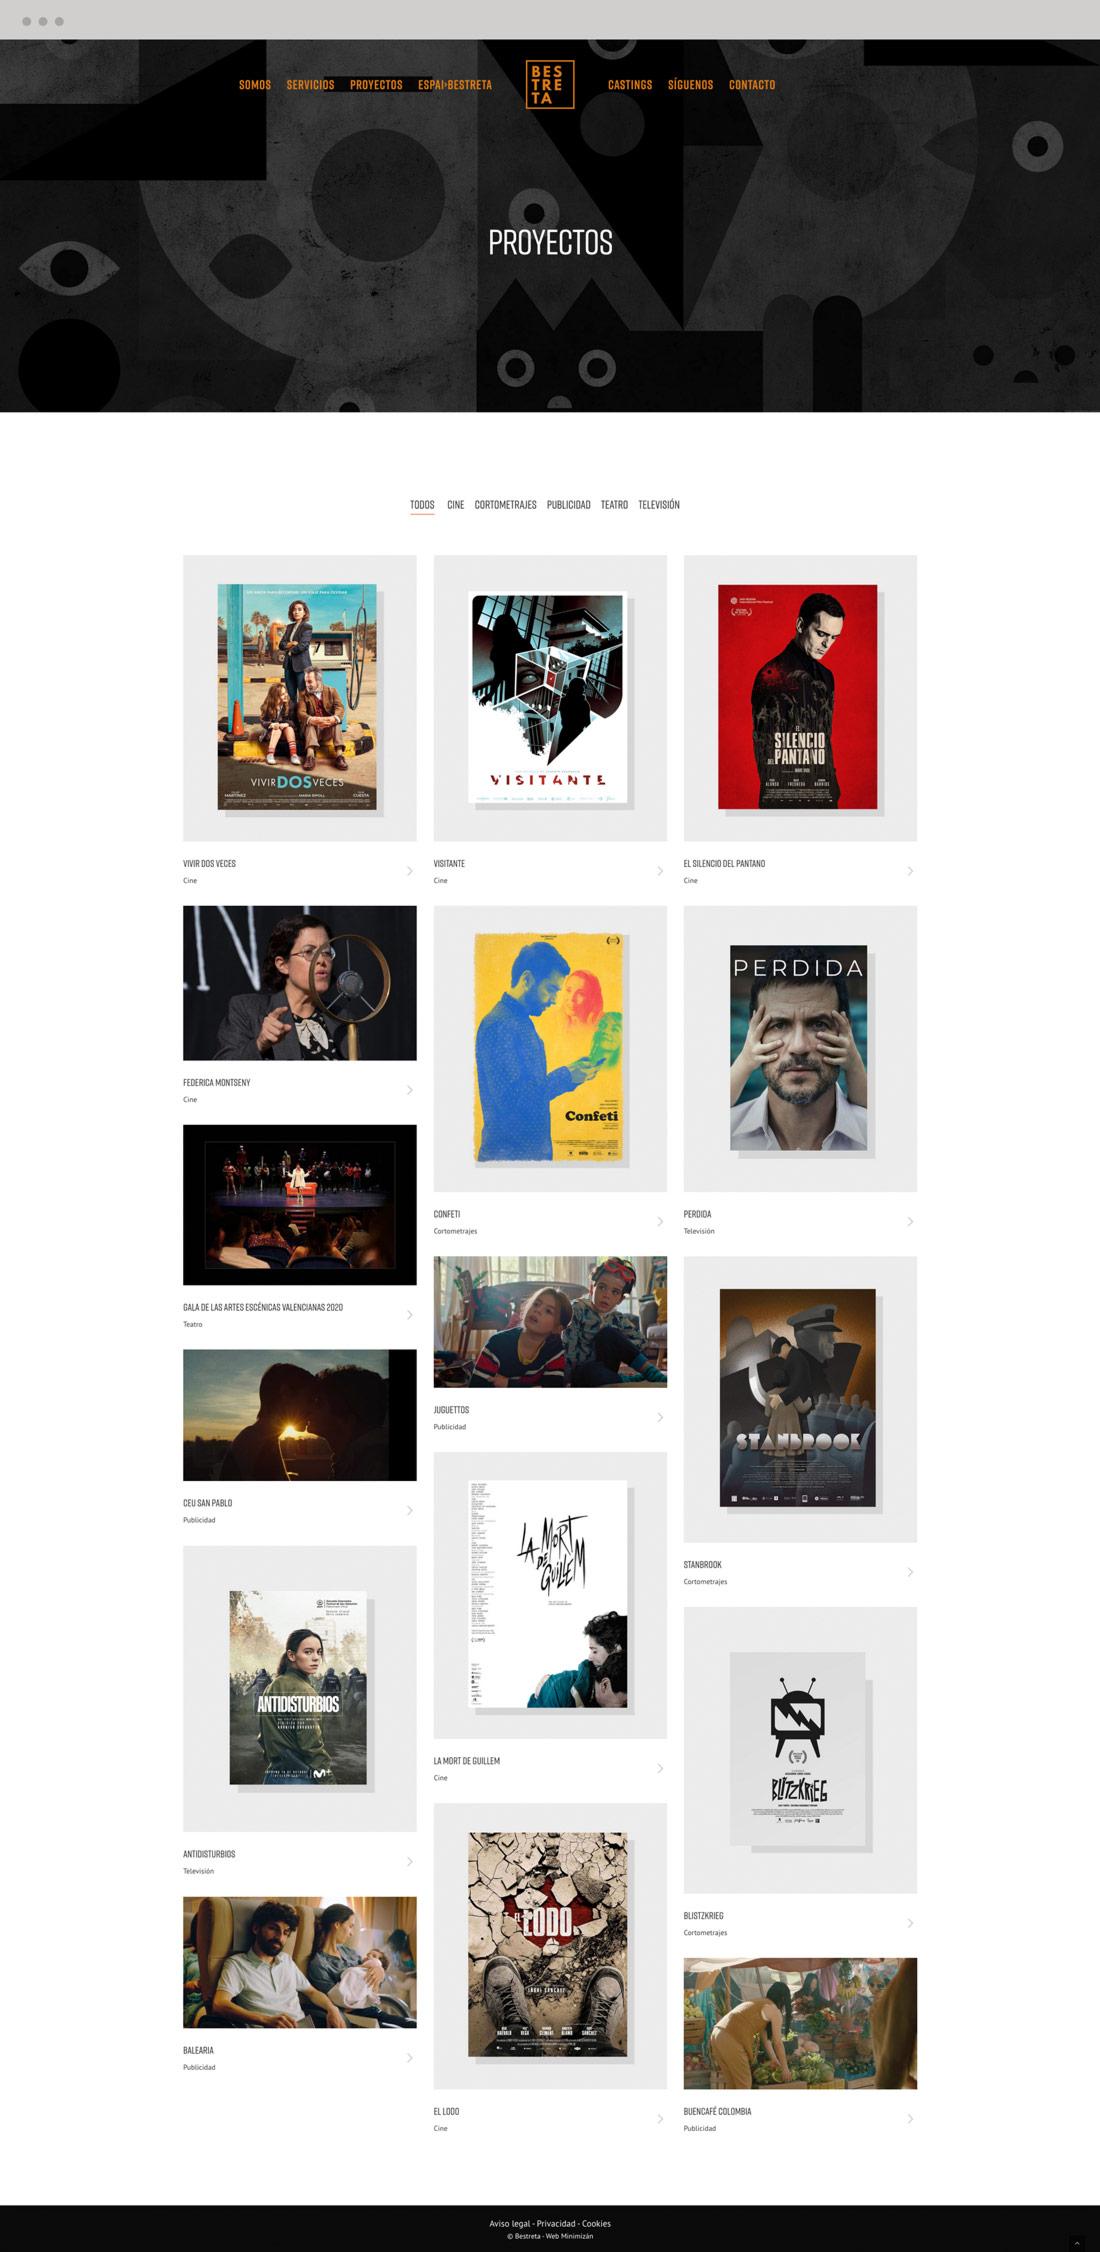 diseño pagina web productora Bestreta vista portatil proyectos